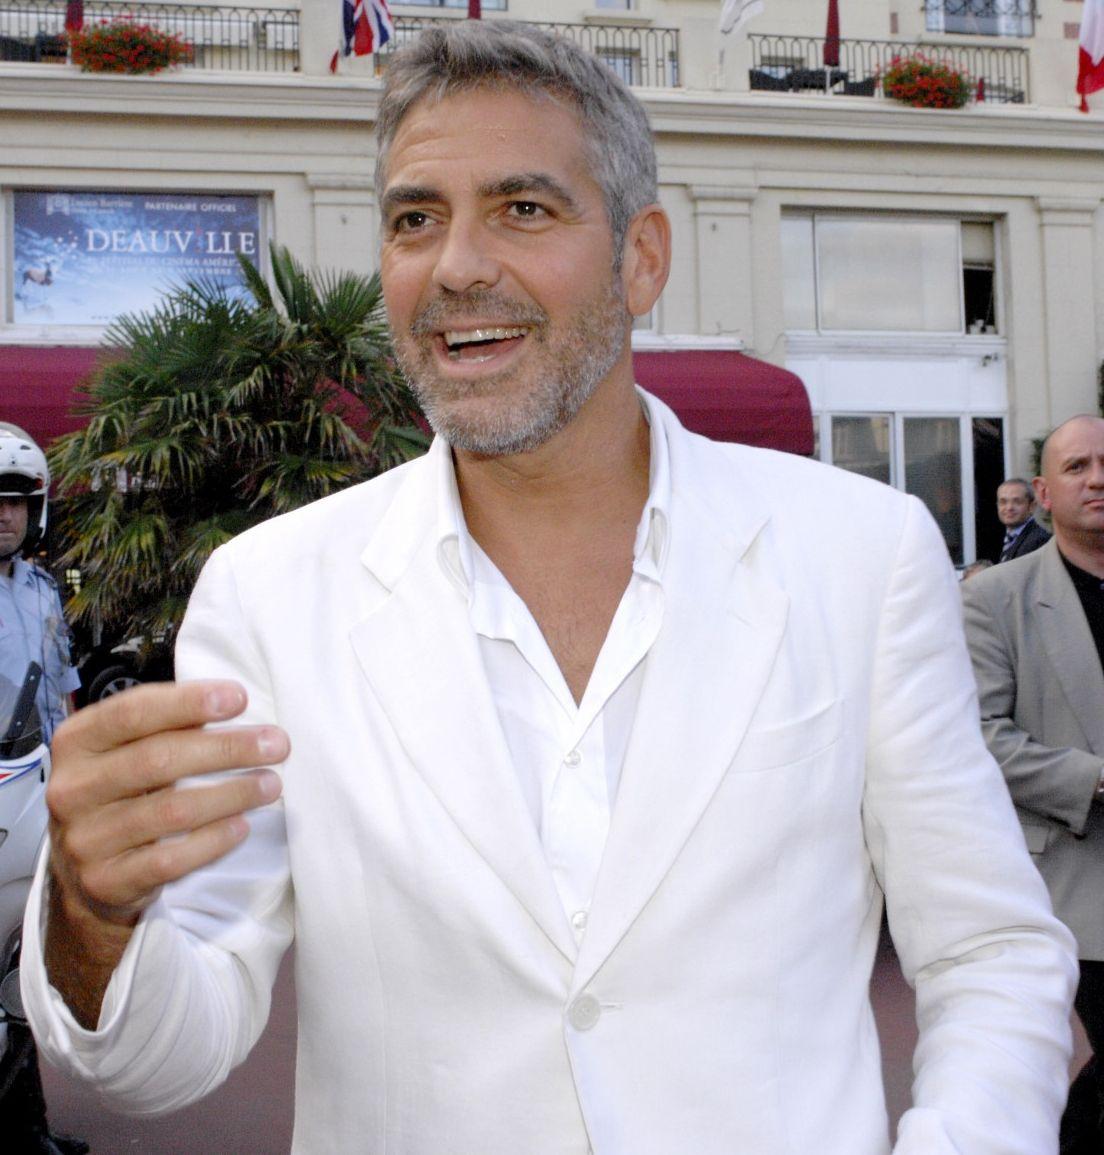 https://i2.wp.com/www.favcelebrity.com/wp-content/uploads/2011/11/George-Clooney_14.jpg